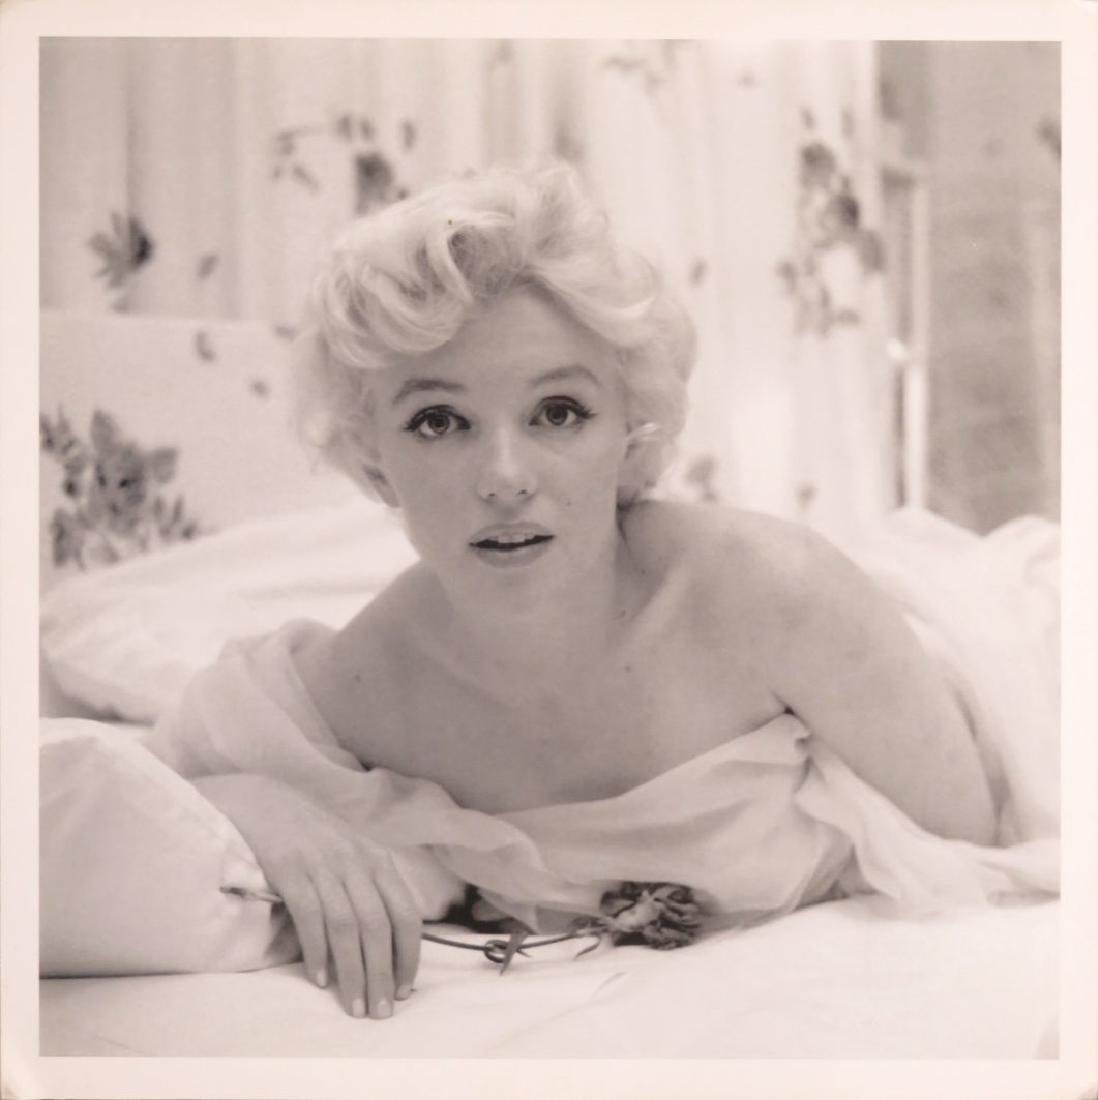 Marilyn Monroe Cecil Beaton Portrait Photo